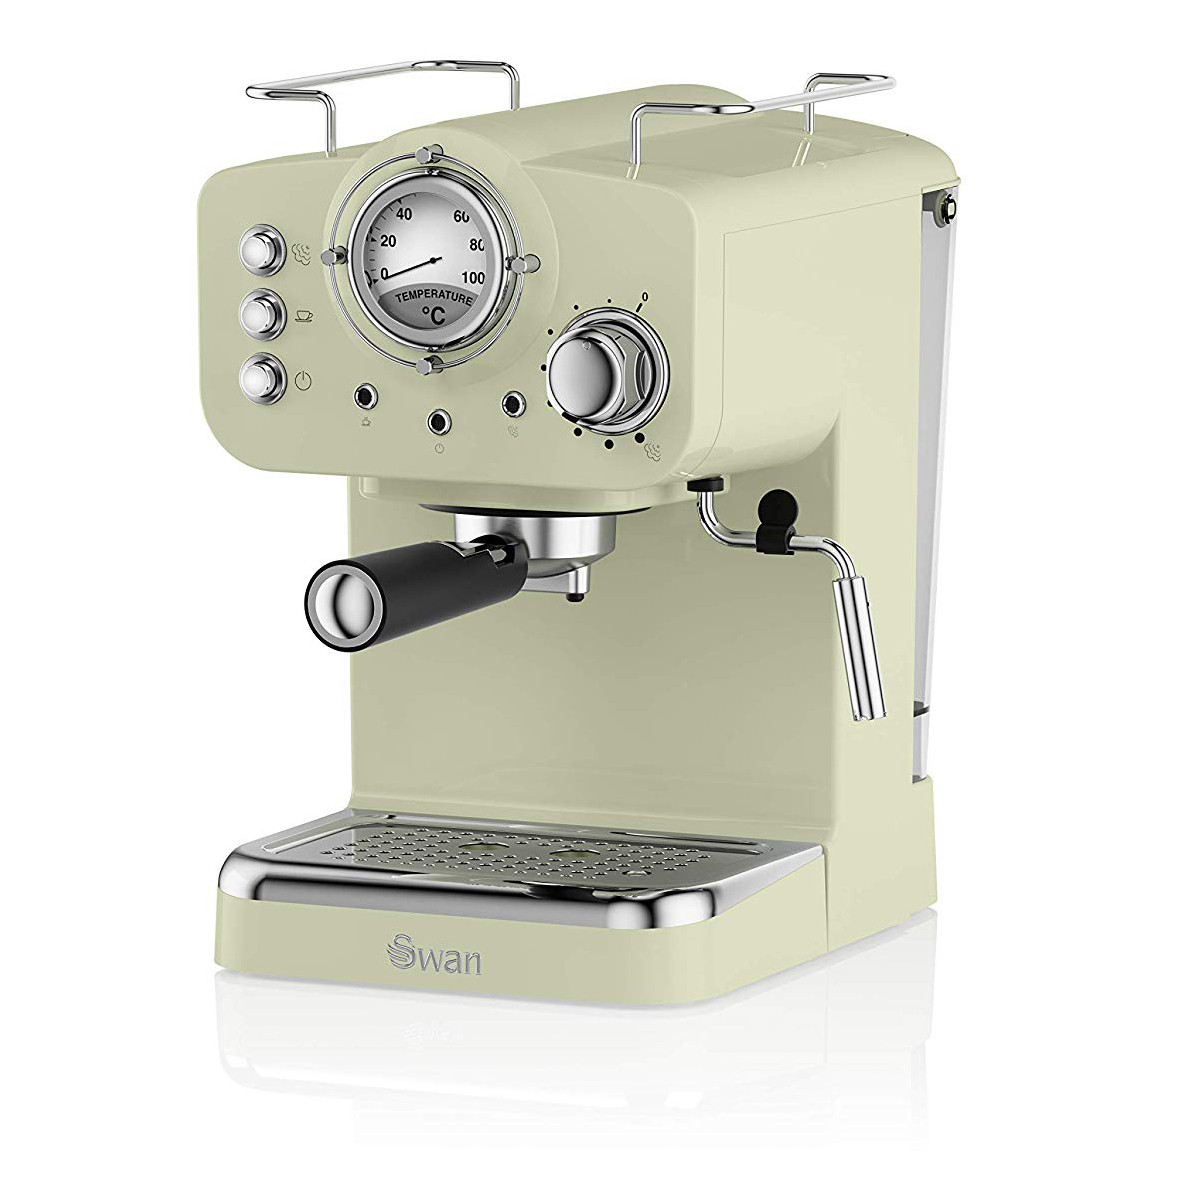 SWN-SK22110GN-Cafetera-retro-vintage-swan-express-verde 1